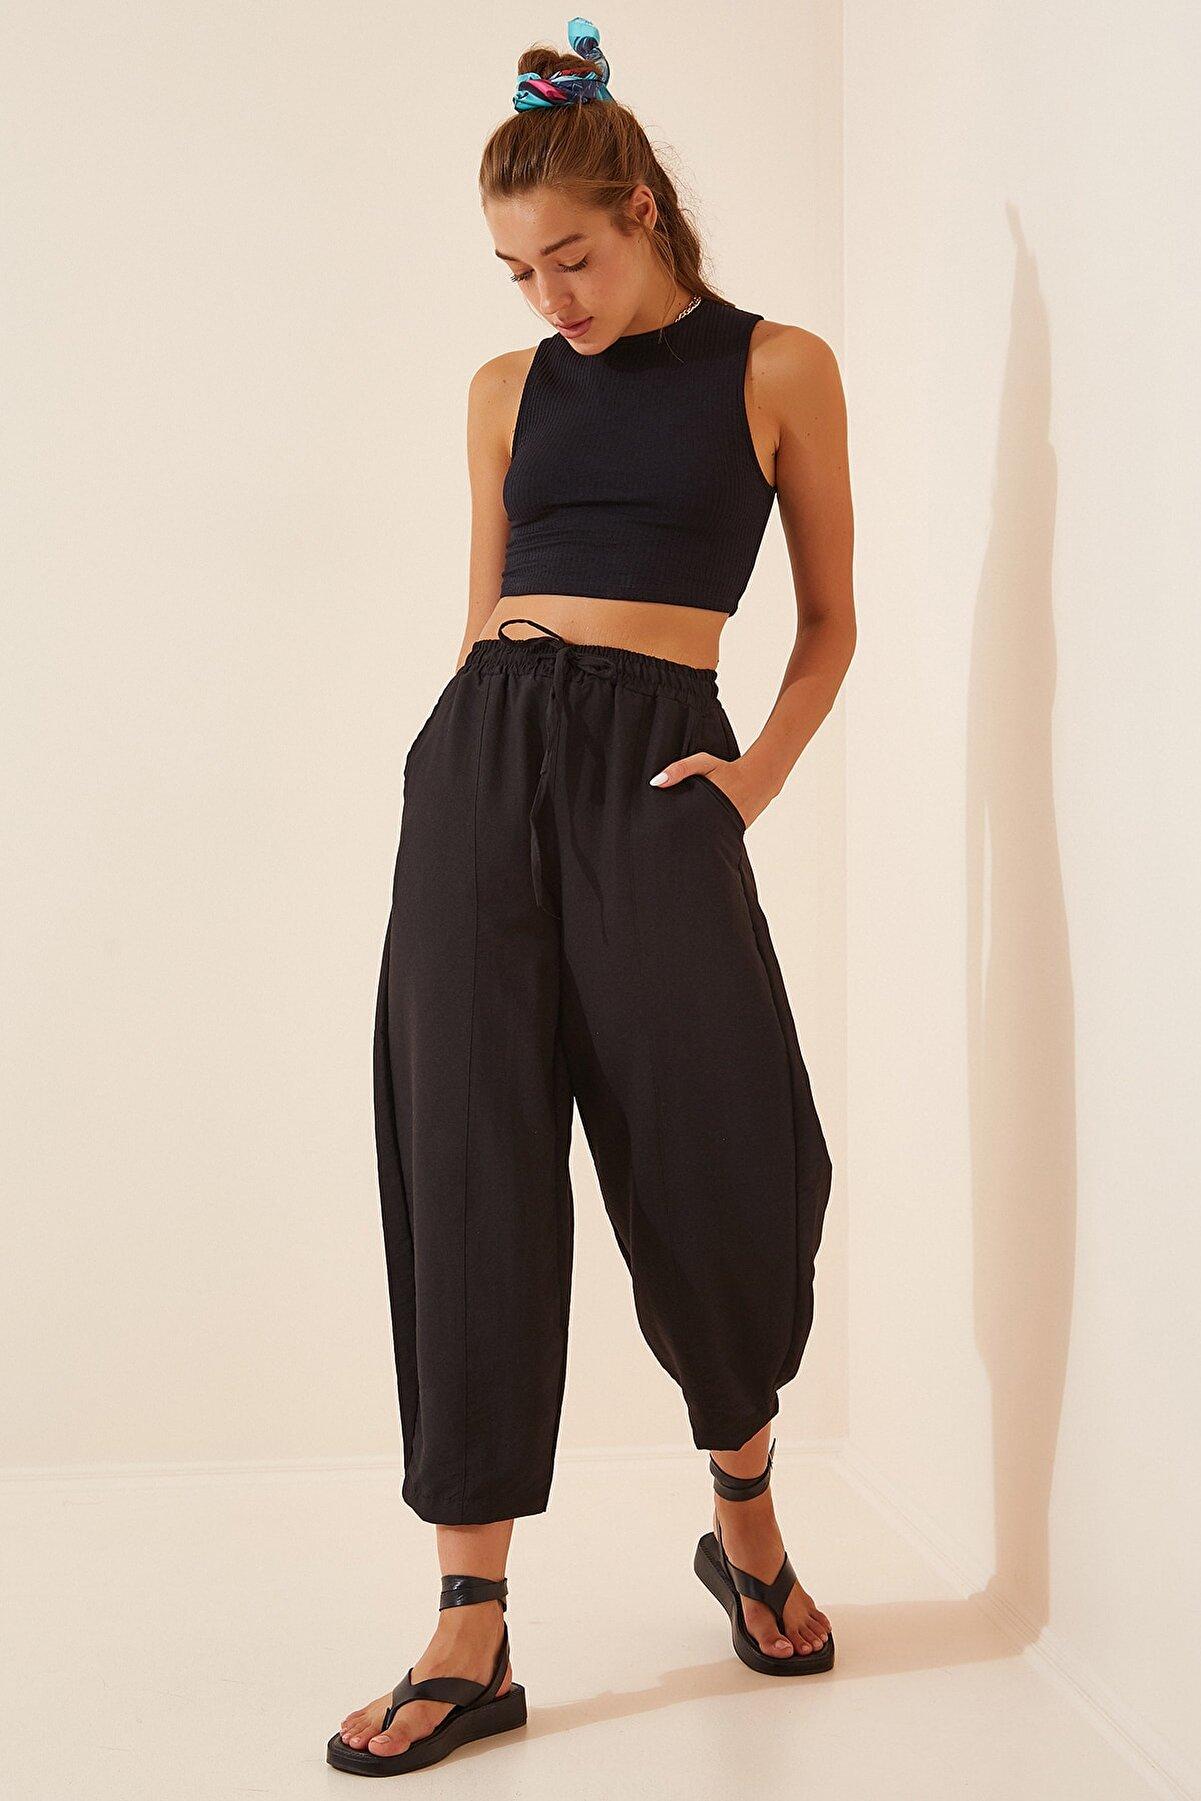 Happiness İst. Kadın Siyah Cepli Keten Viskon Şalvar Pantolon CV00001